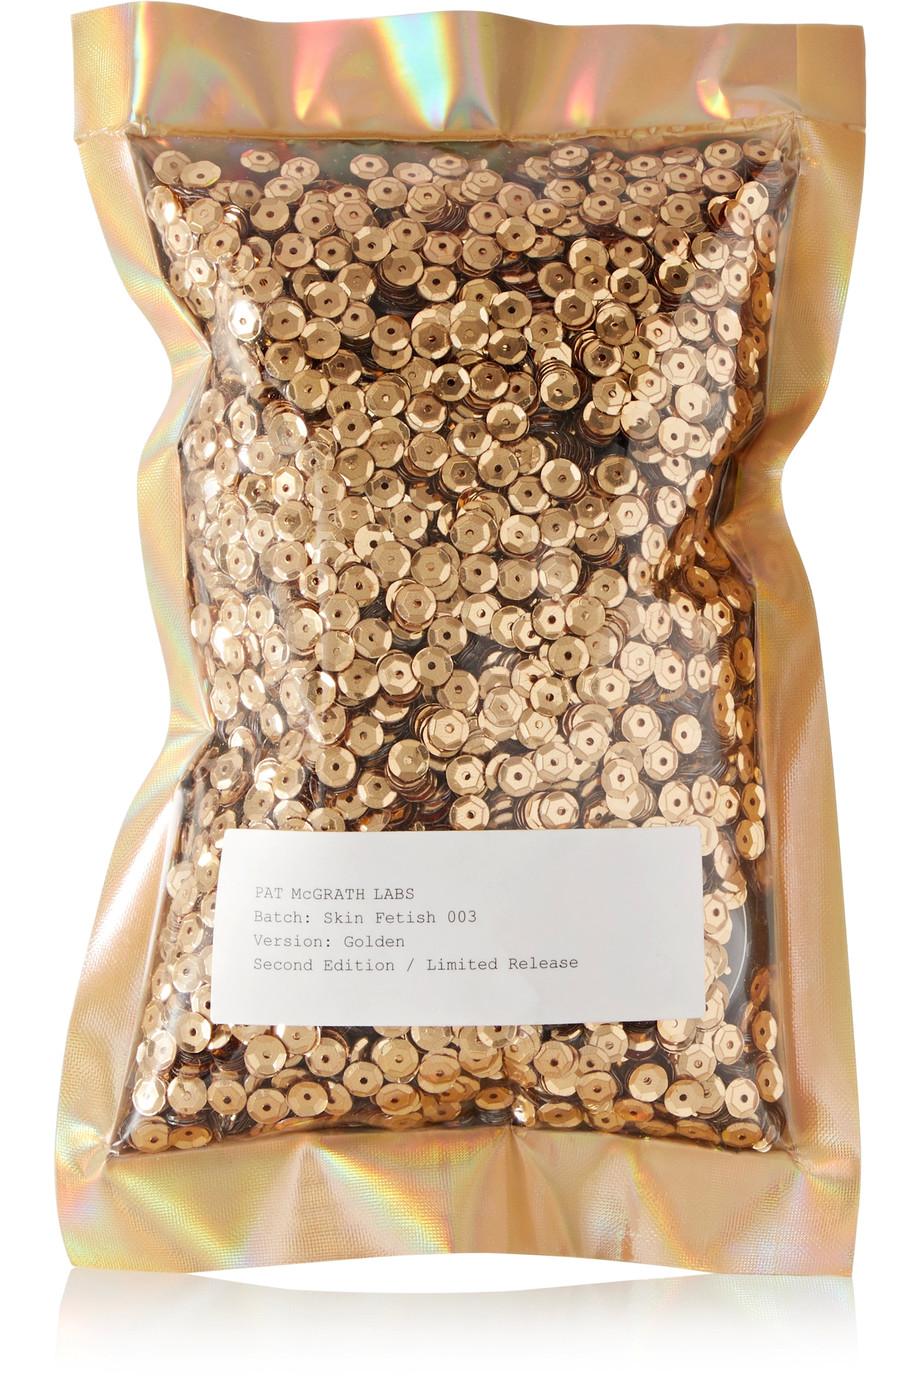 Pat McGrath Skin Fetish 003 Kit in Golden Bag.jpg